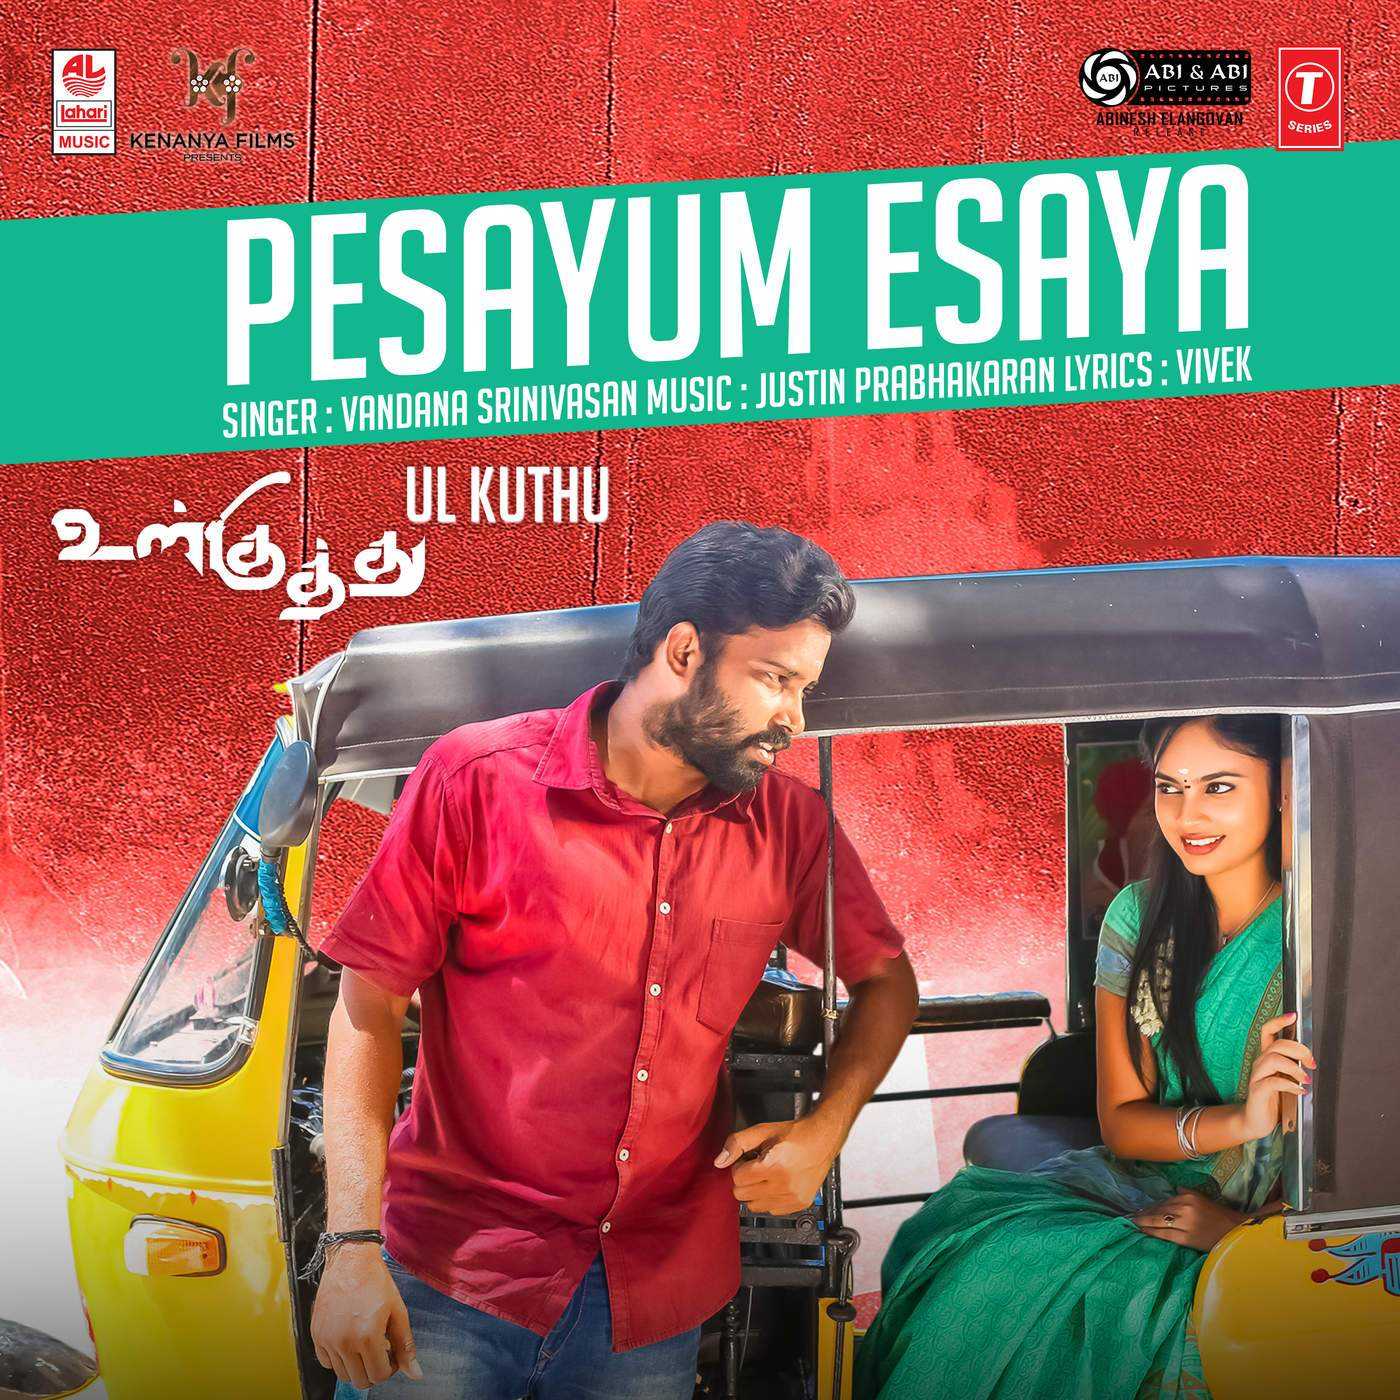 All Remix Songs Tamil Kuthu 2: Pesayum Esaya Lyrics